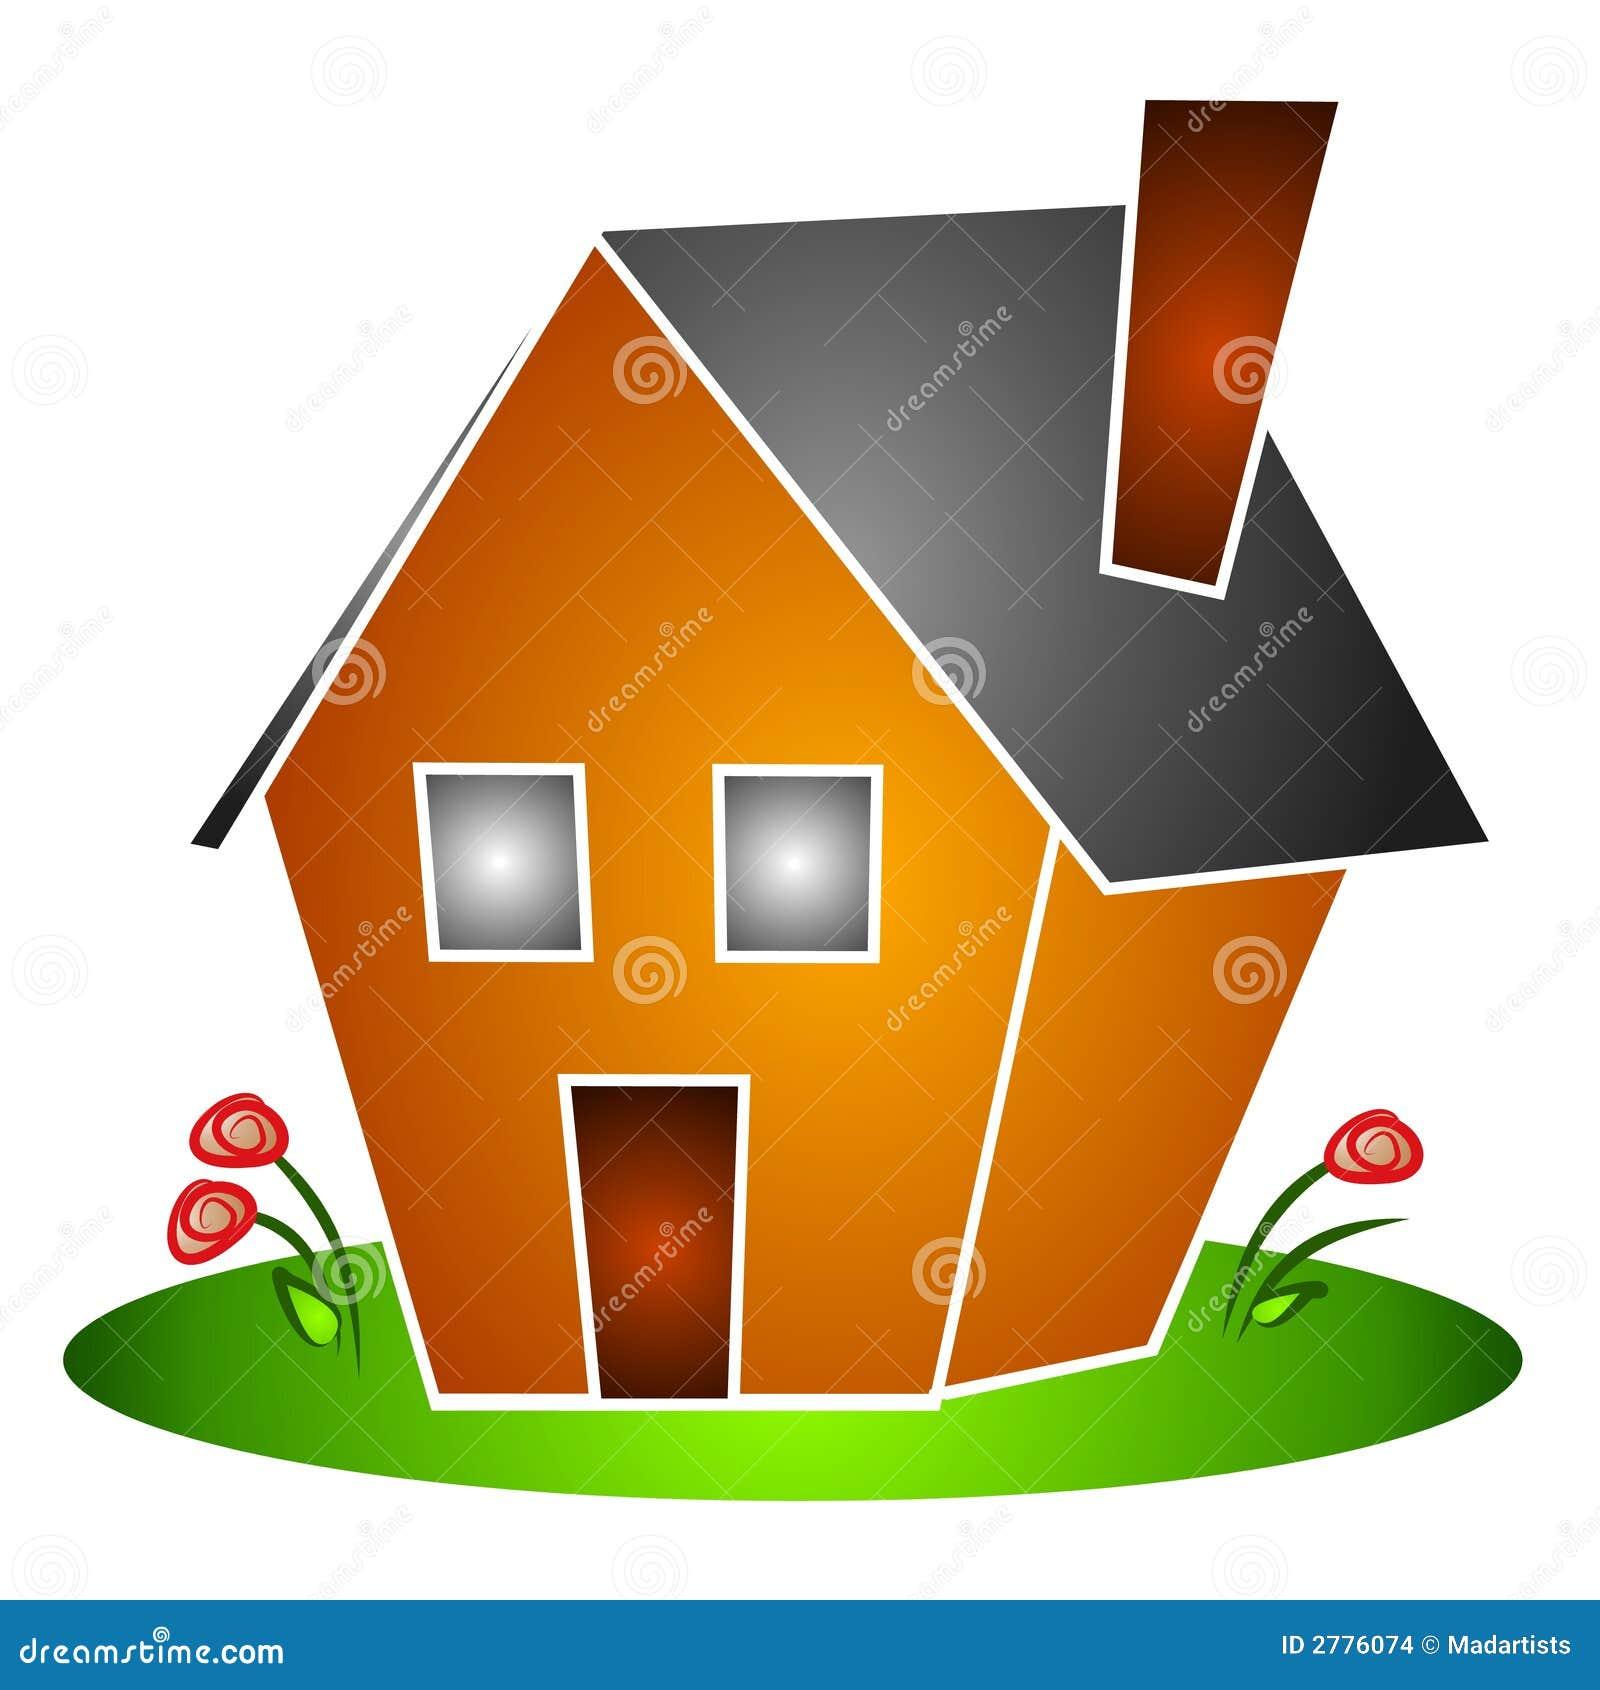 house clipart: